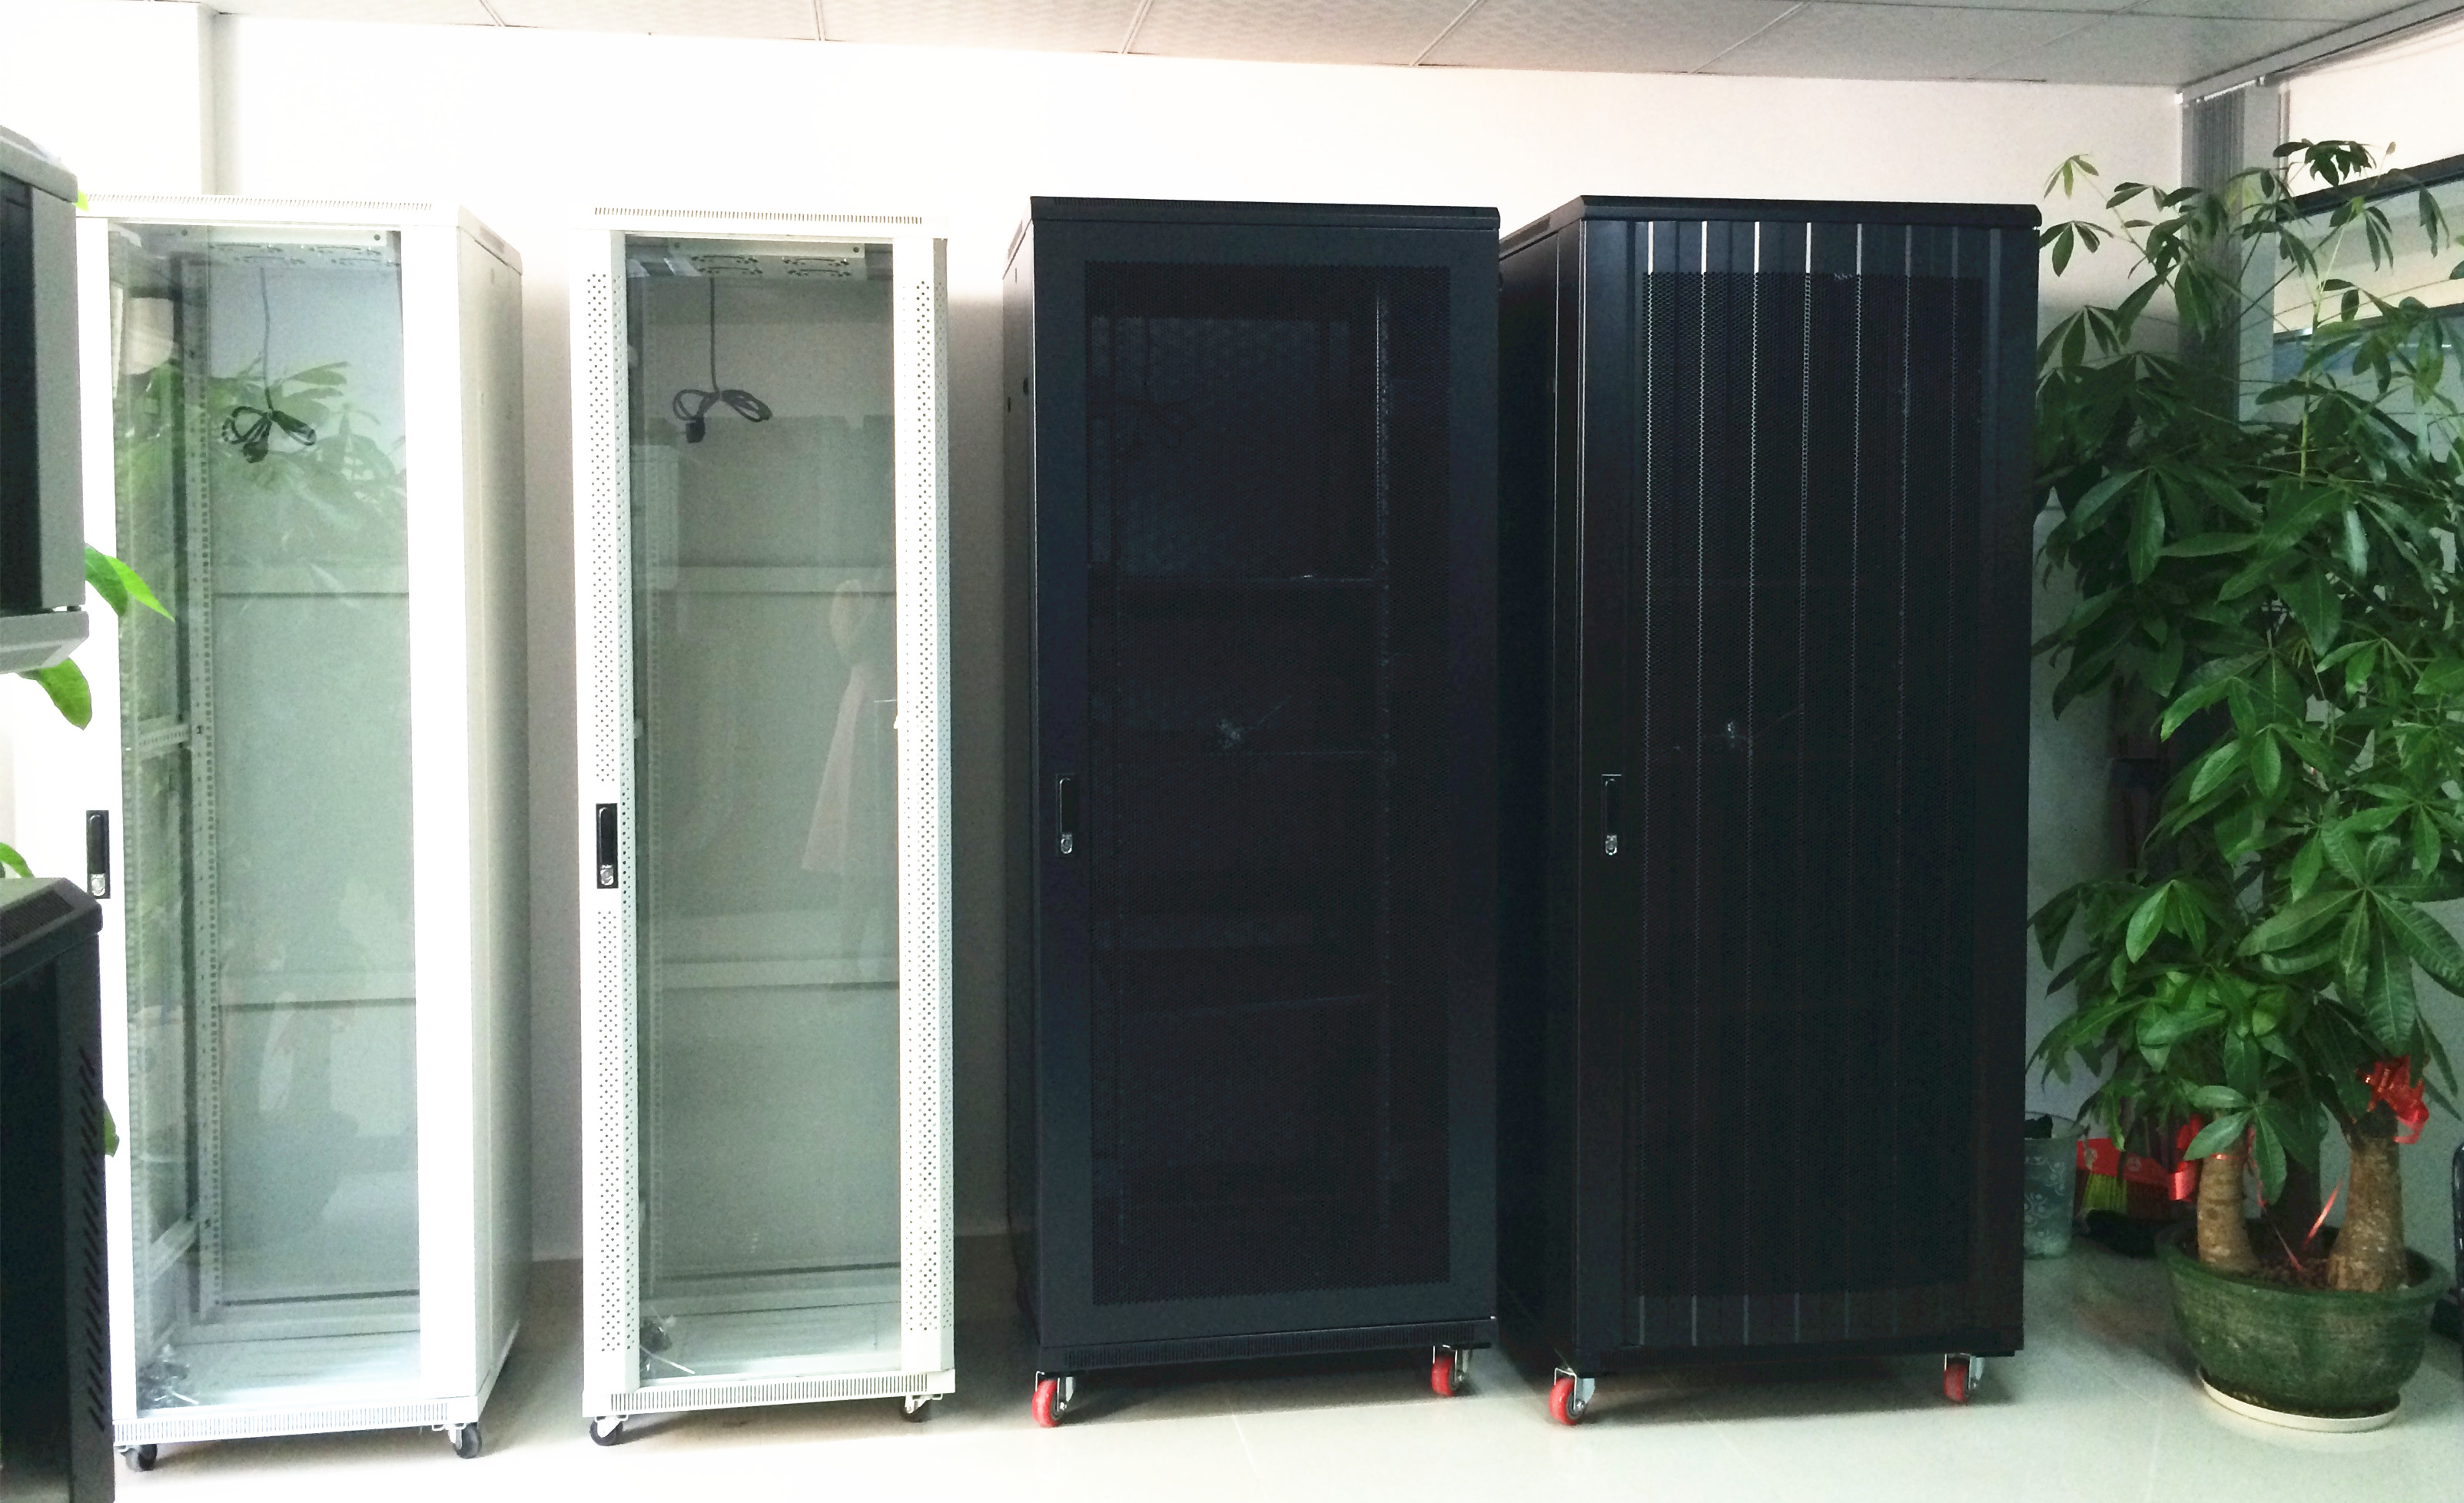 Yalian Industries 19quot Server Rack Enclosure Manufacutre